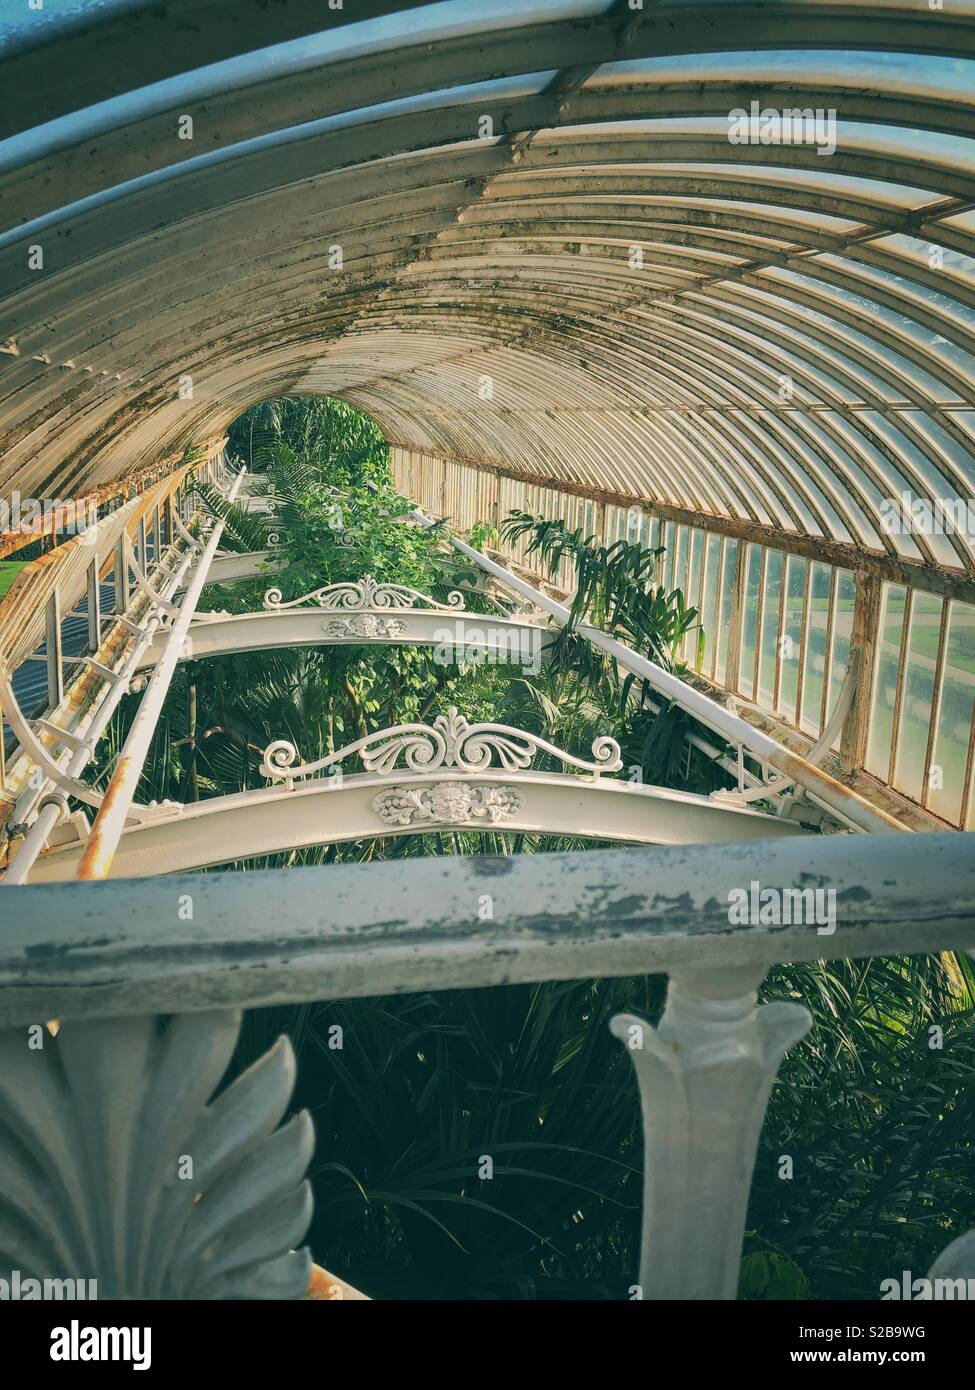 Greenhouse conservatory - Stock Image